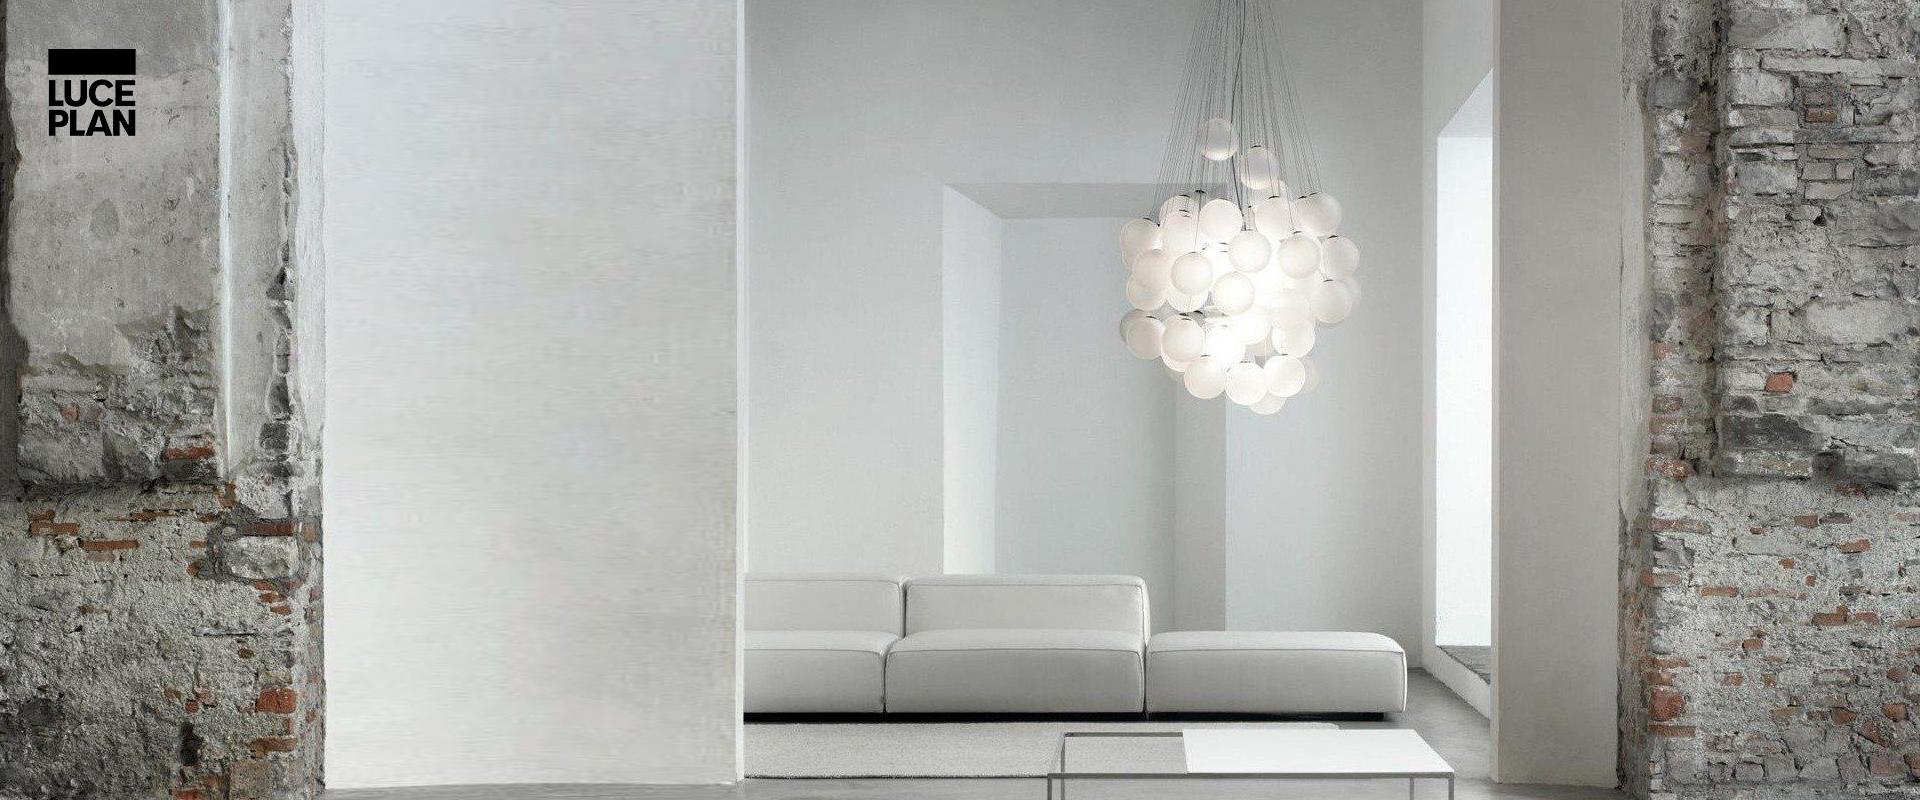 designlinqnl licht interieur